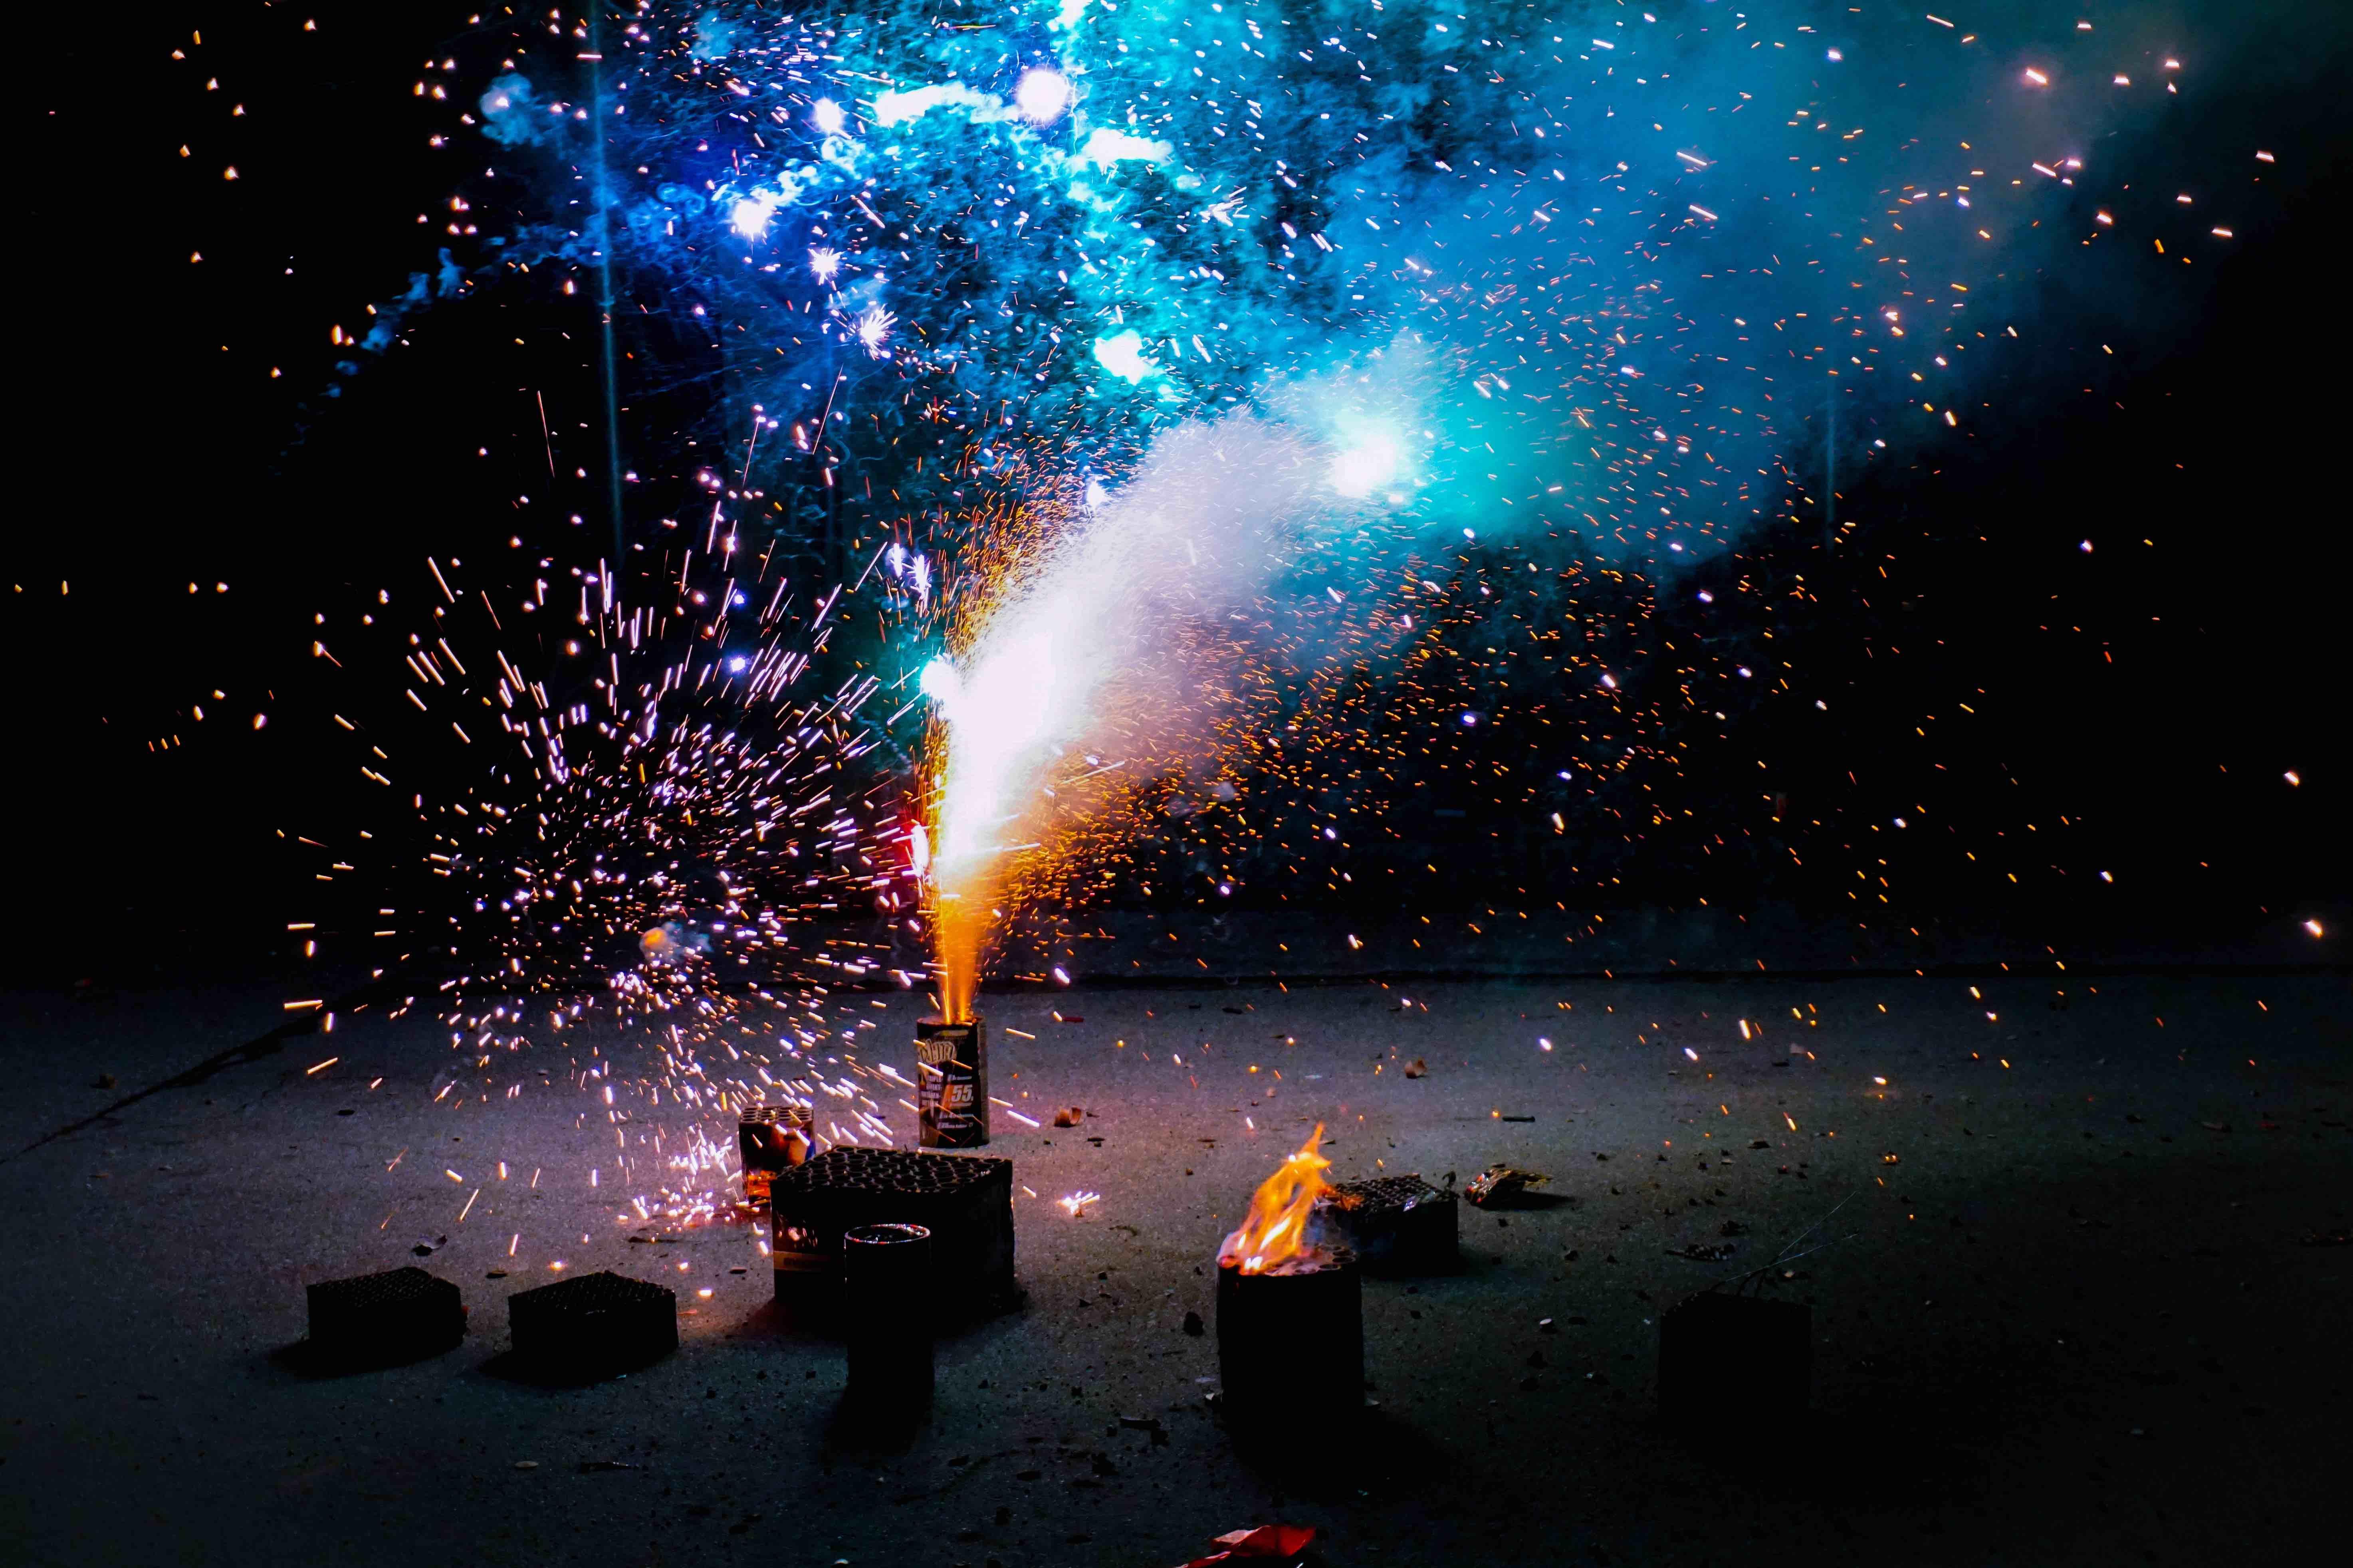 fyrværkeri, fireworks